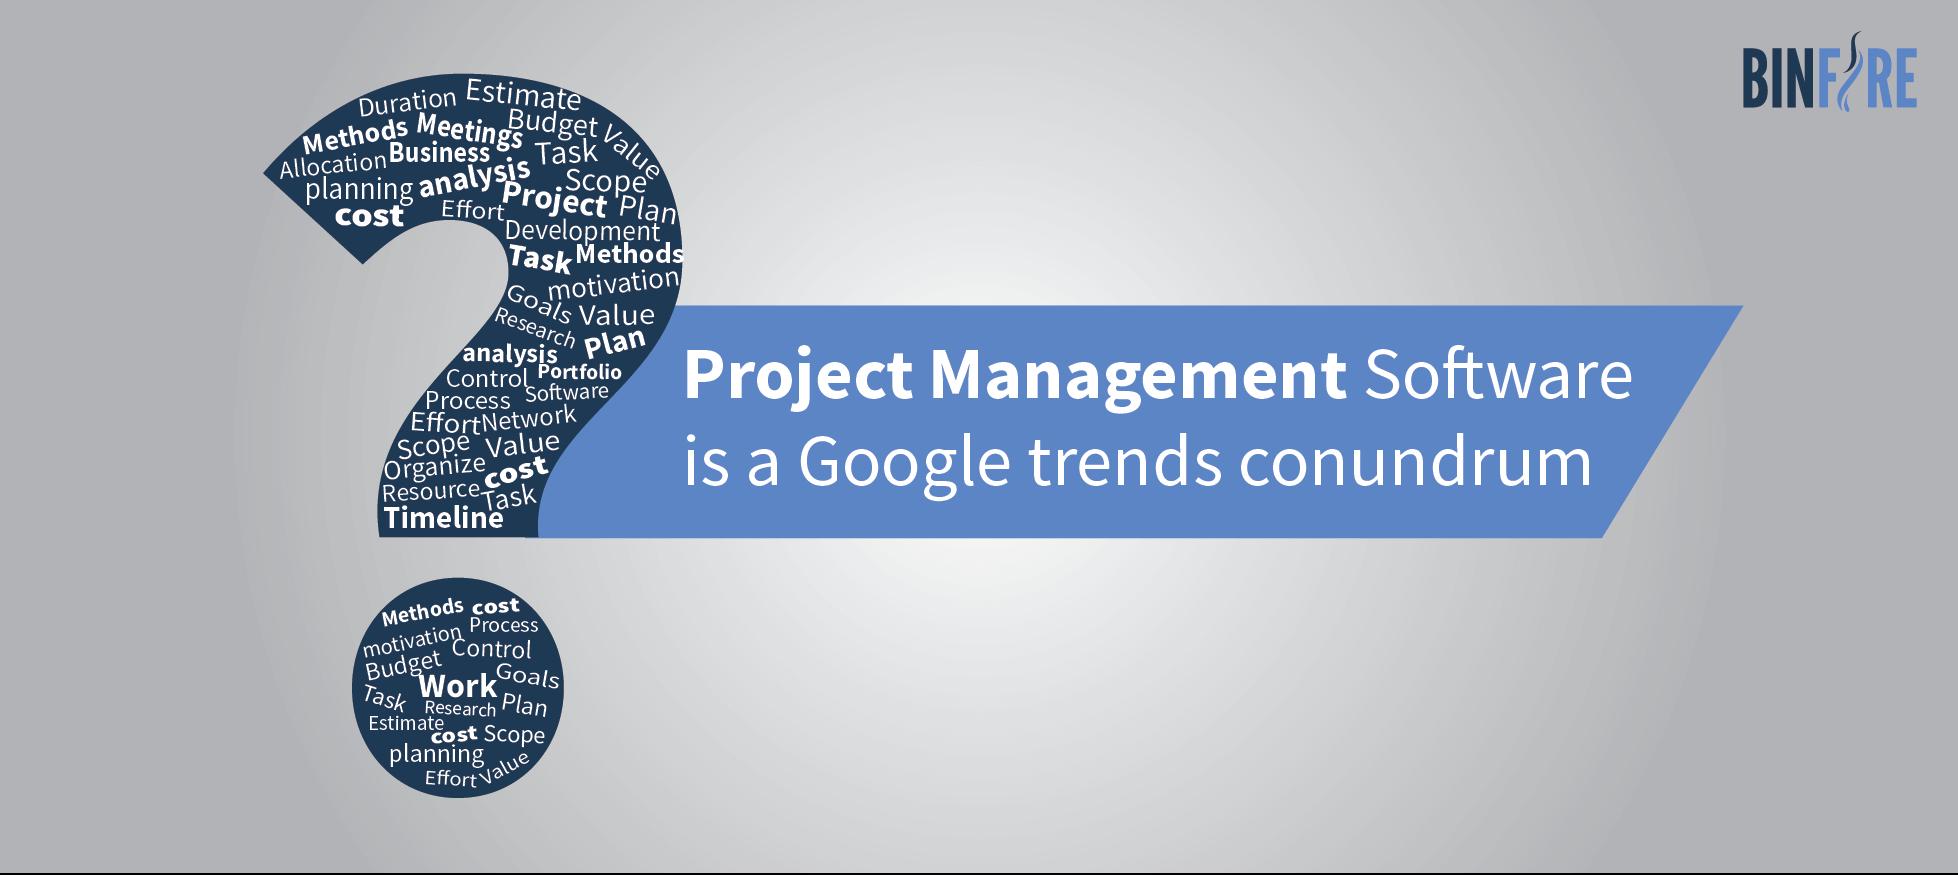 Binfire_Blog creative_Project management is a google trend conundrum-01